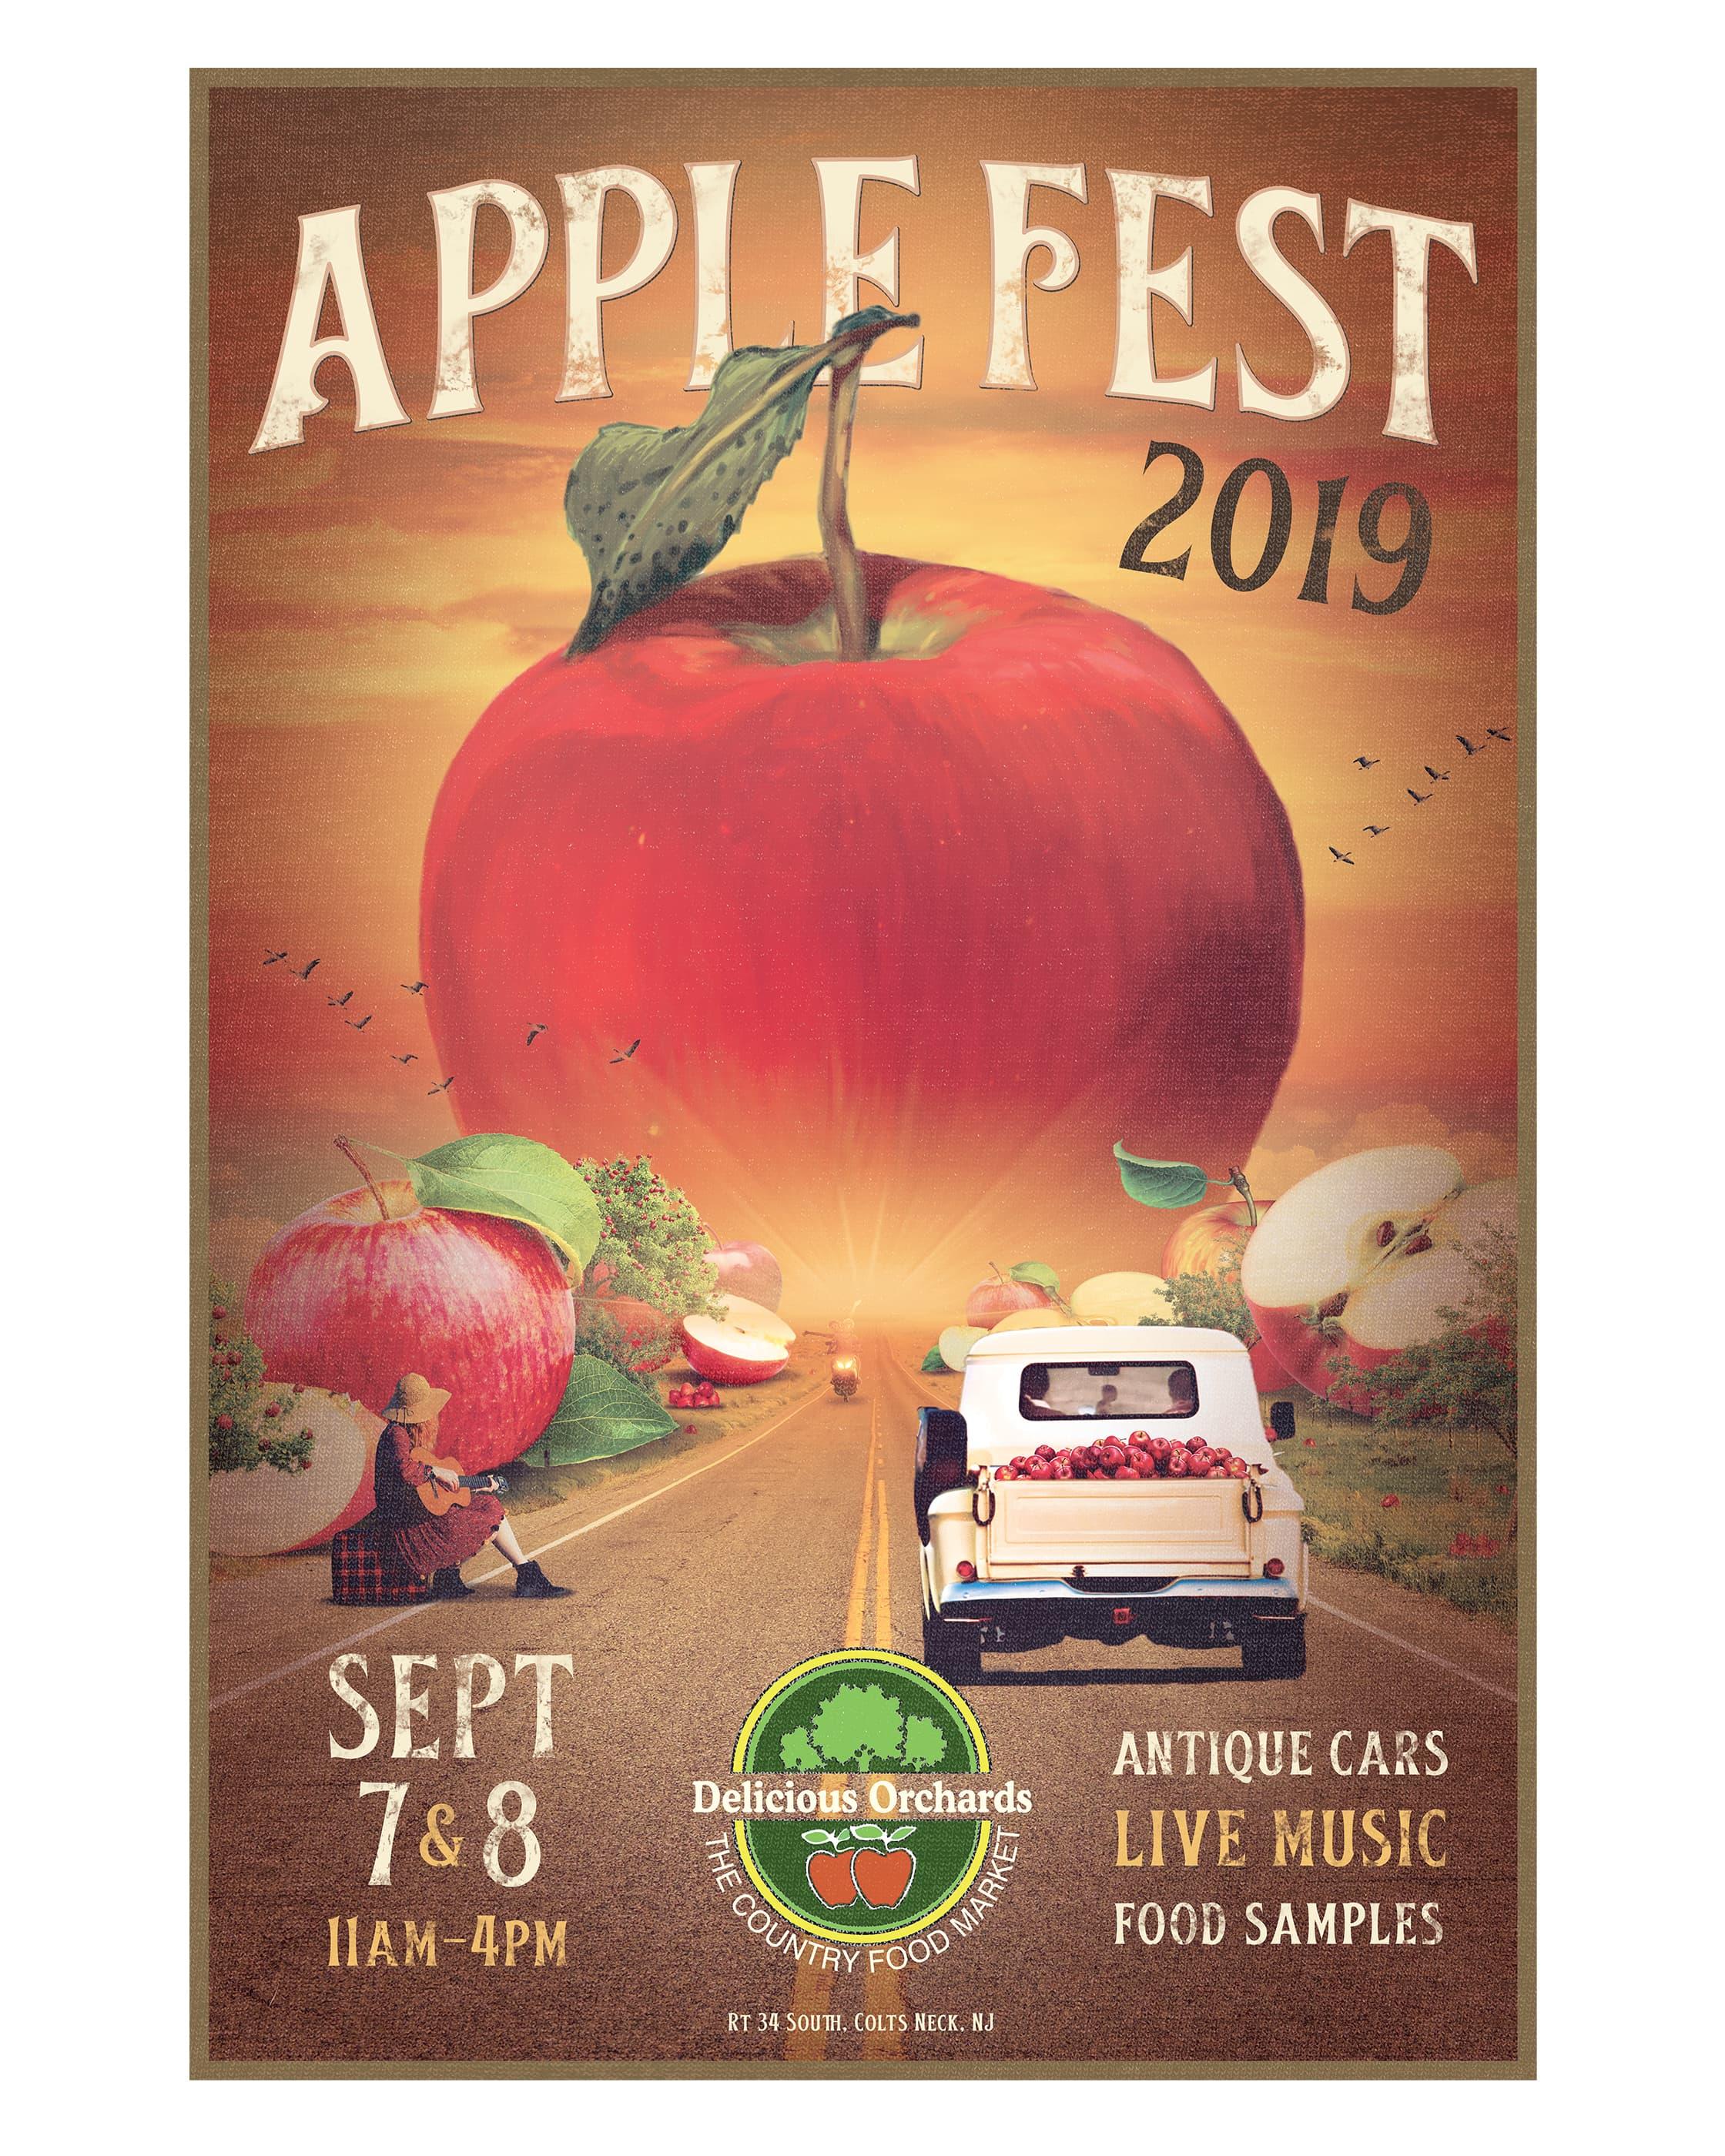 Applefest Poster 2019